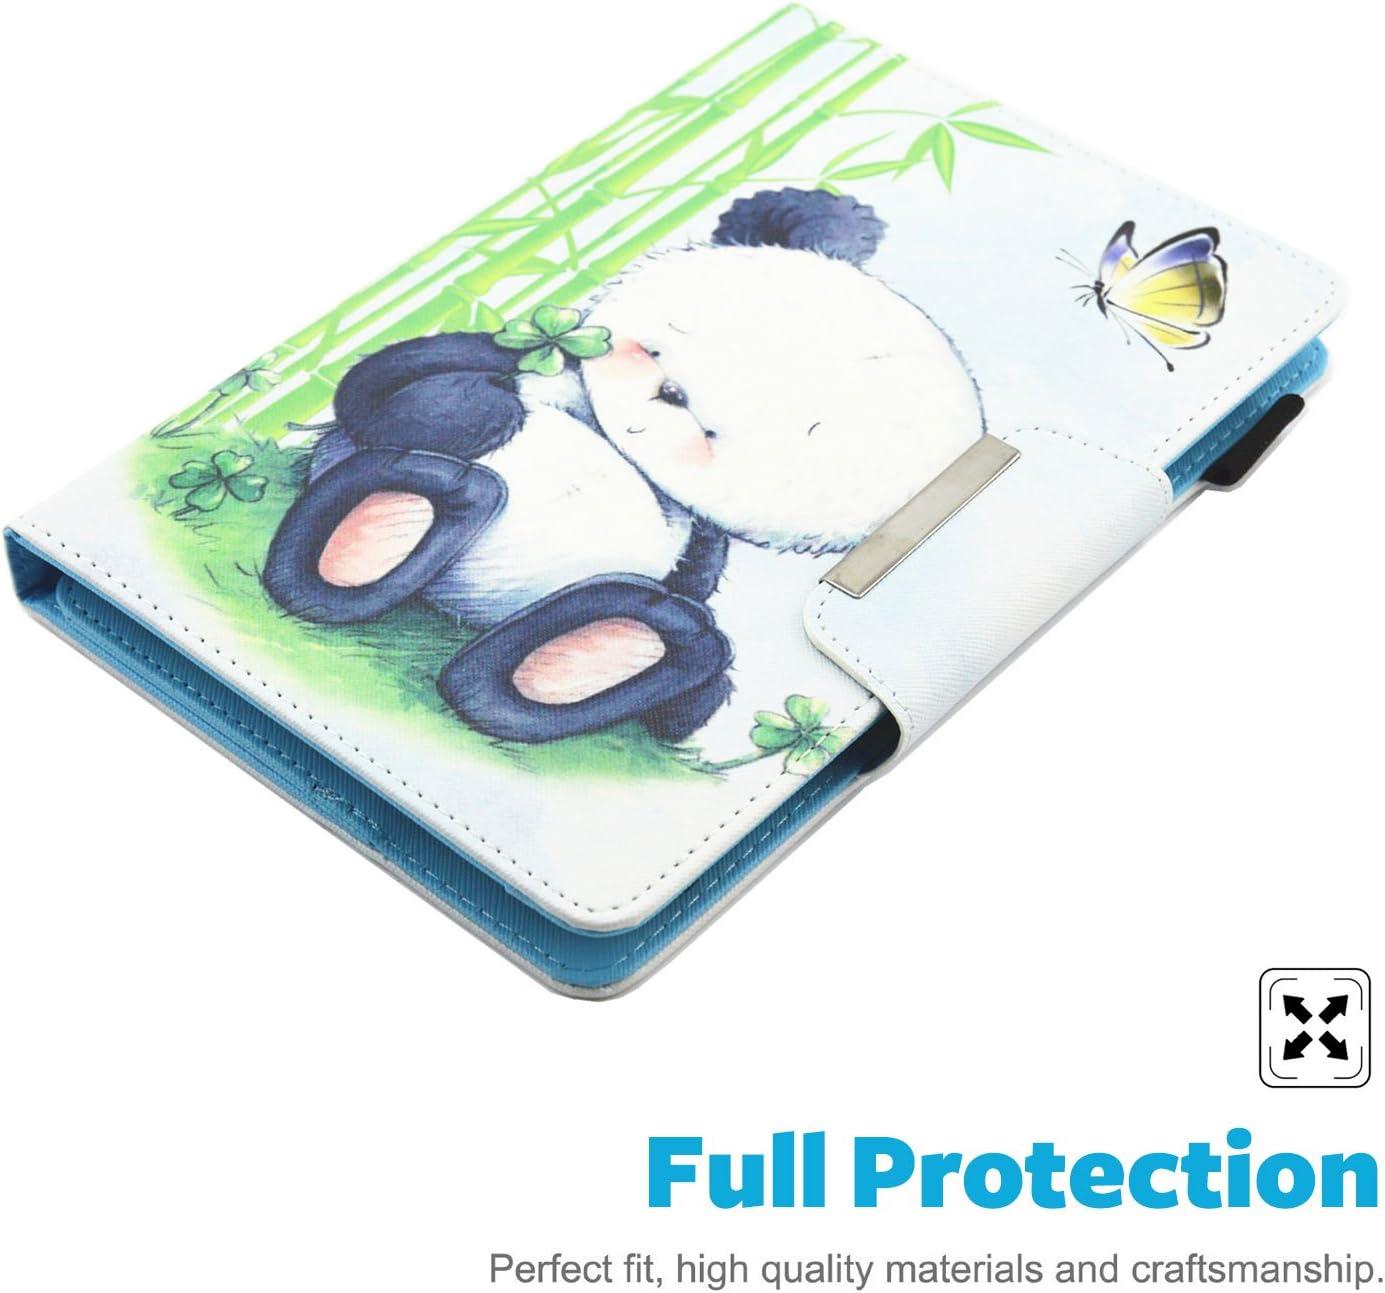 HP LG G Pad RCA Dteck Huawei Prestige Pro-Hisense y m/ás Andriod Windows Tablet DELL ASUS Google Funda Universal para Apple iPad Samsung Galaxy KOBO